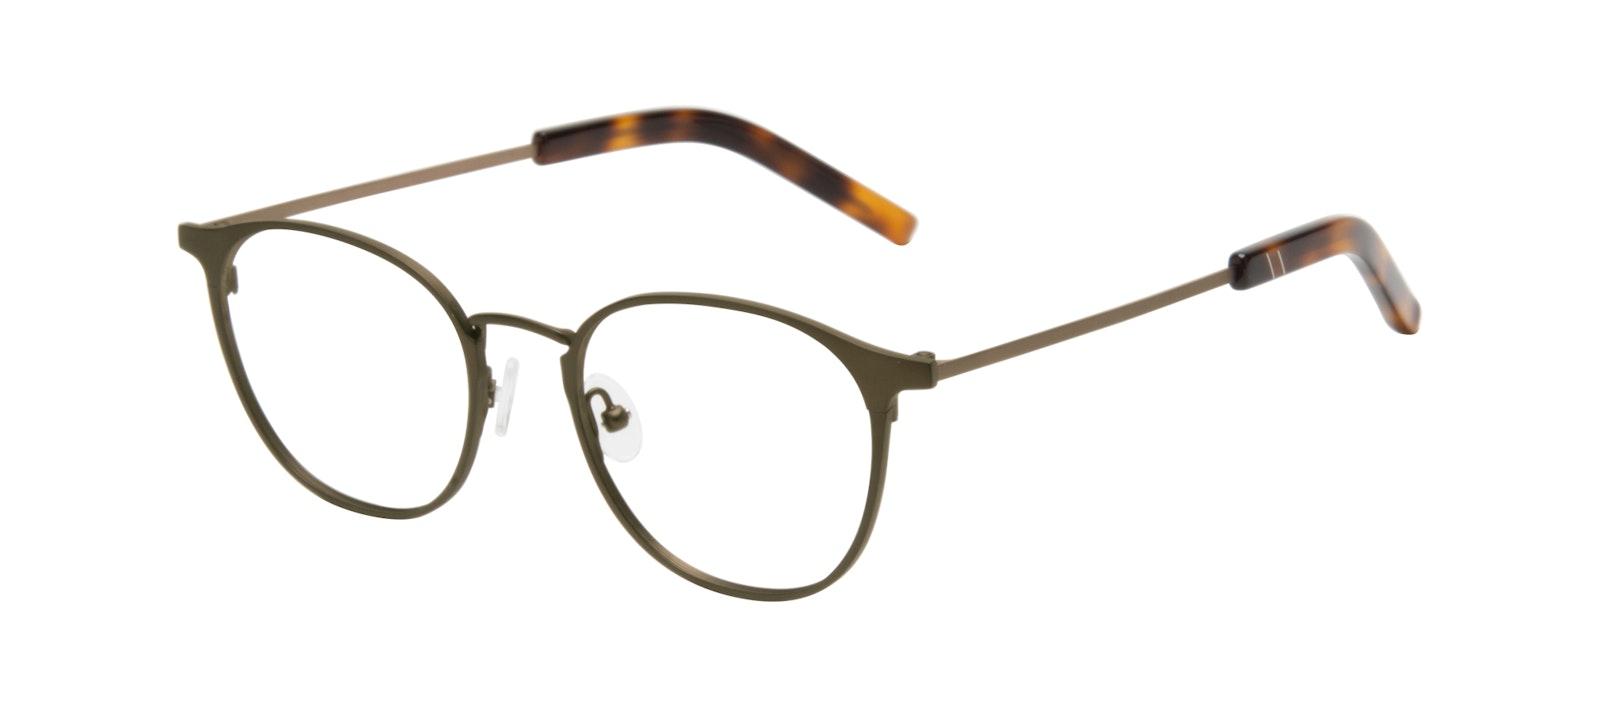 Affordable Fashion Glasses Round Eyeglasses Men Point Khaki Tilt